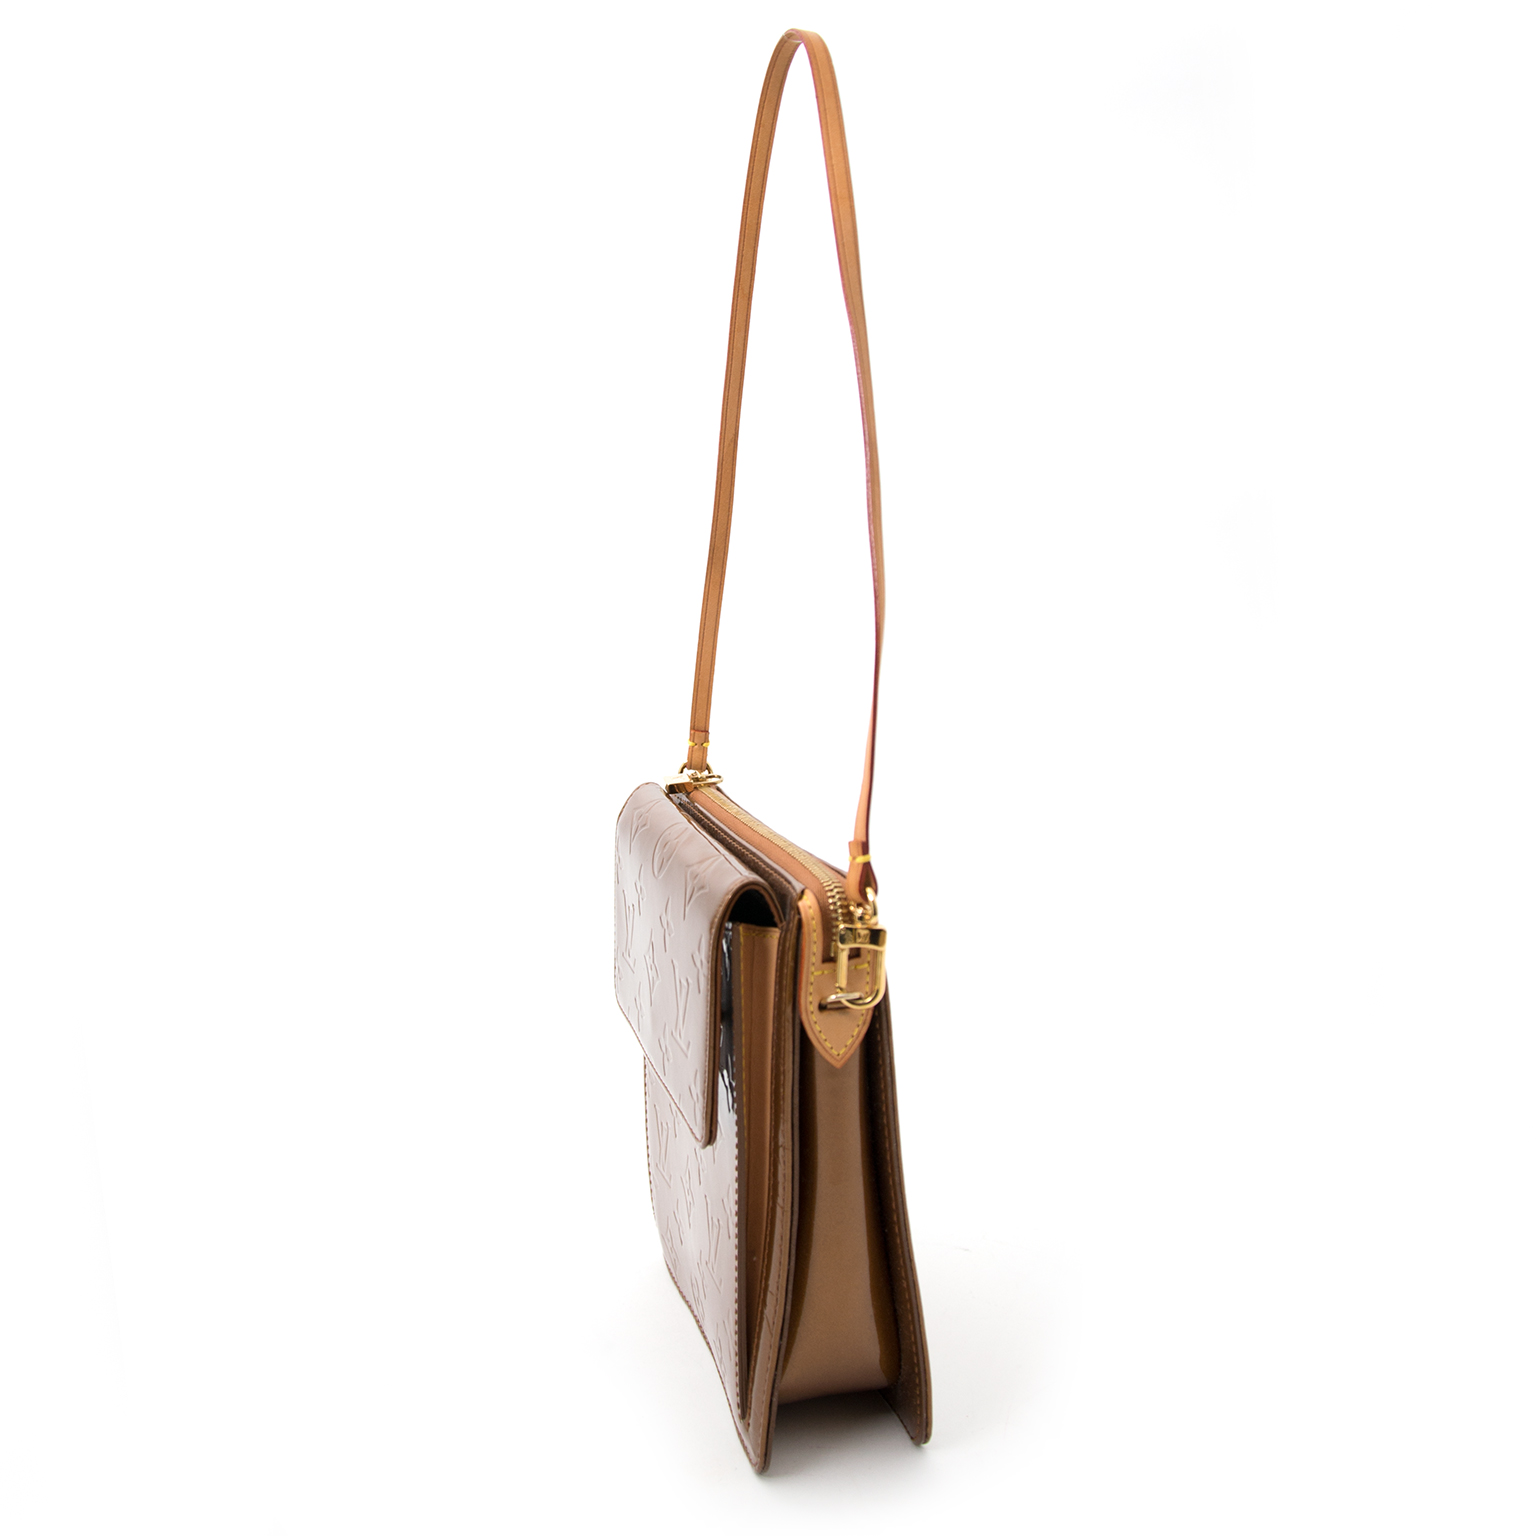 Louis Vuitton Bronze Vernis Mott Monogram Bag now online at labellov.com